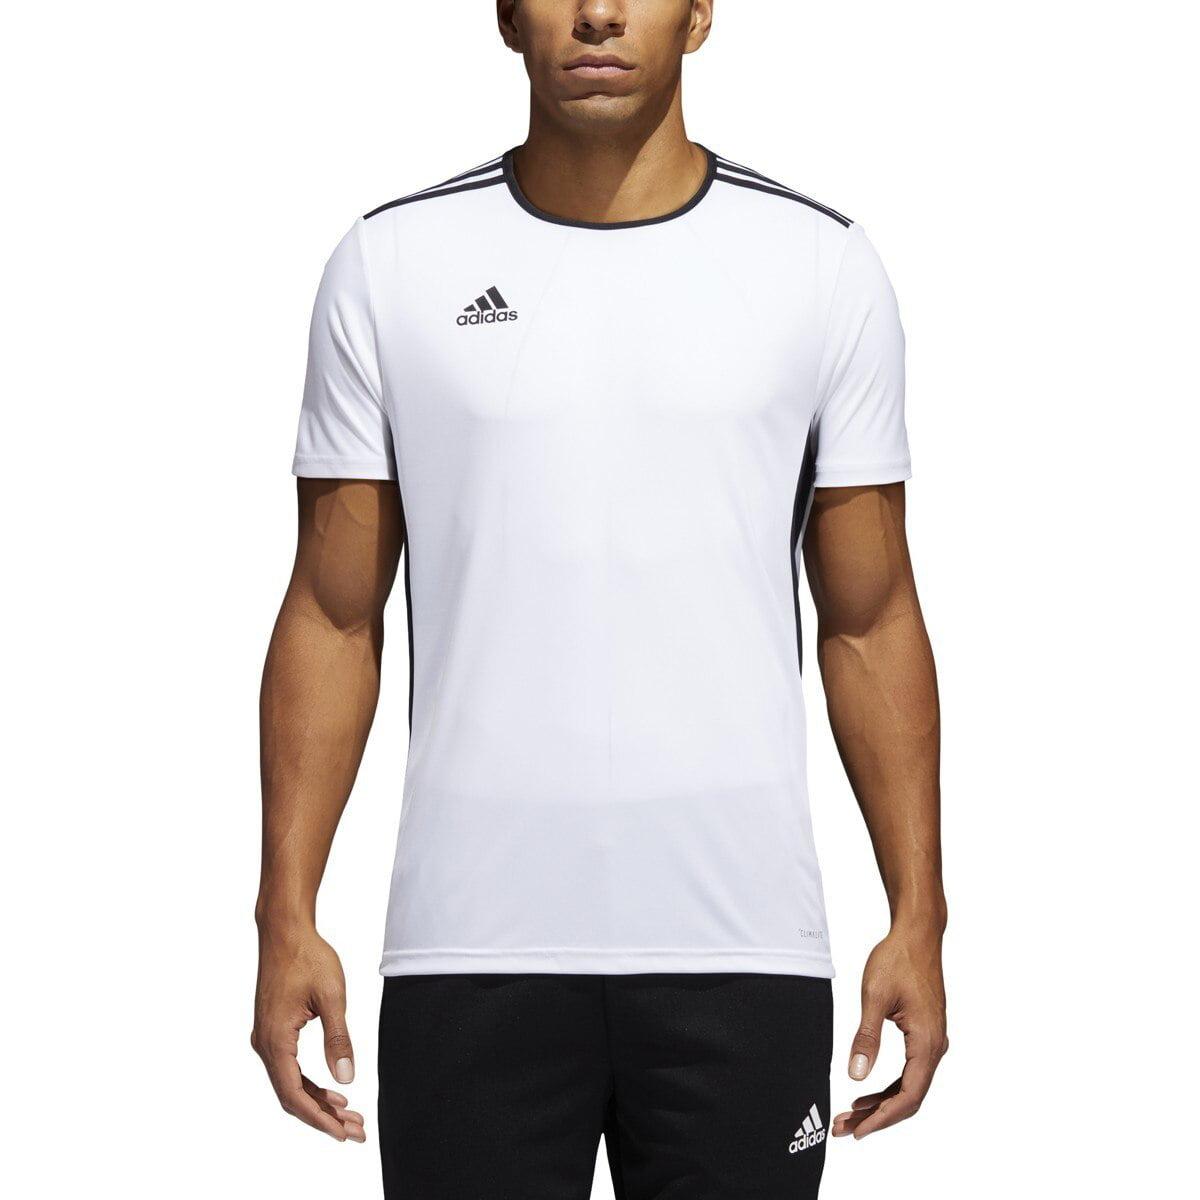 Adidas Entrada Adult Soccer Jersey CD8438 - White, Black - Walmart.com